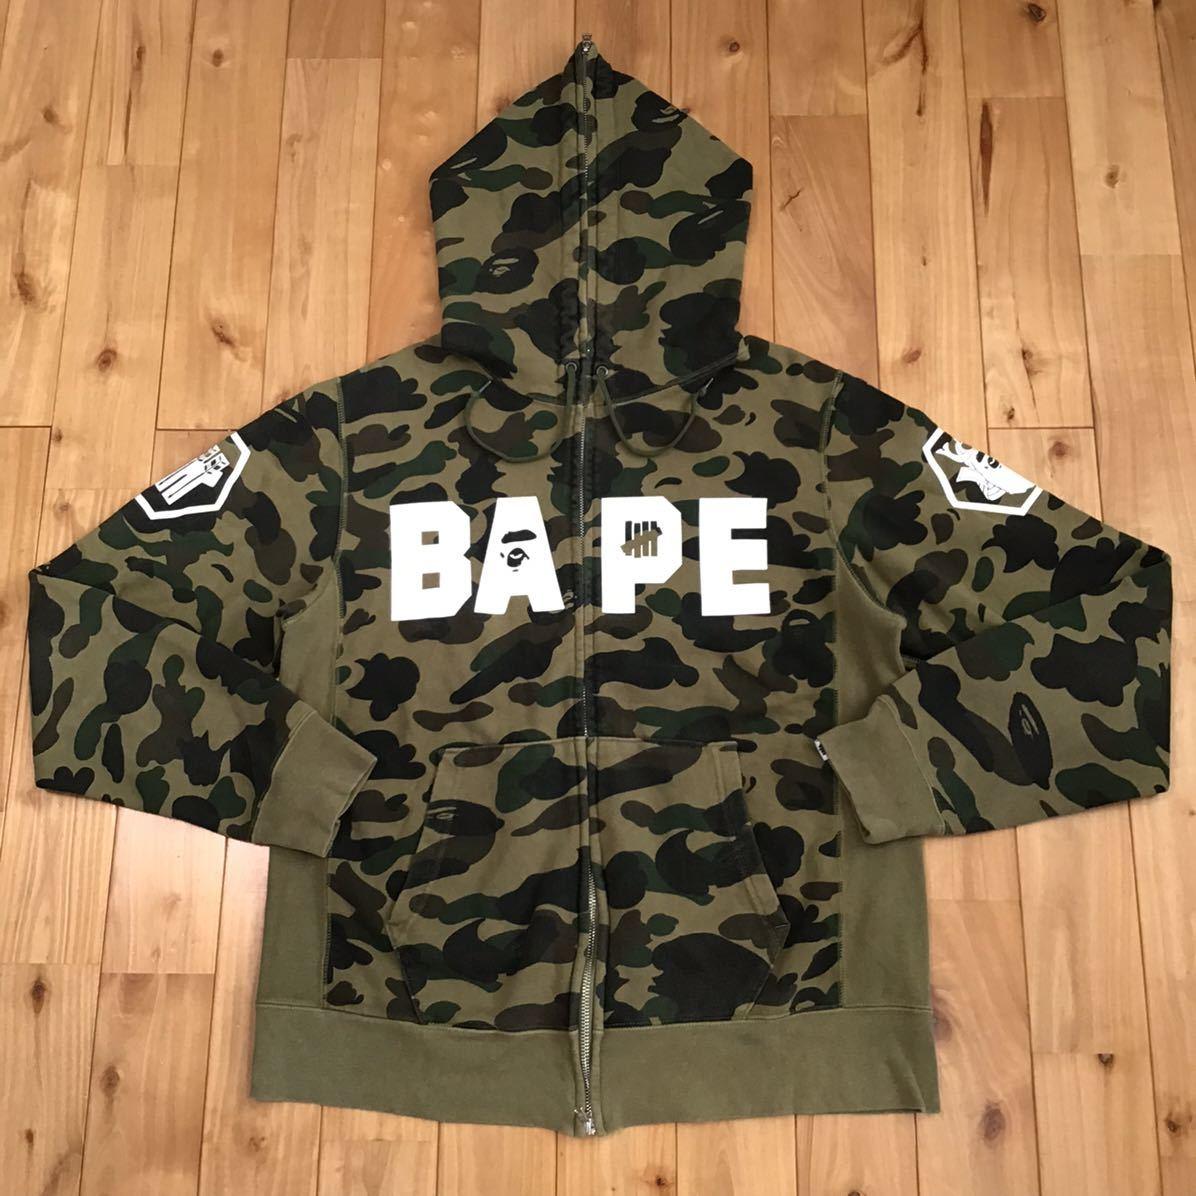 undefeated × BAPE フルジップ パーカー Lサイズ a bathing ape full zip hoodie 1st camo green エイプ ベイプ アベイシングエイプ ns3